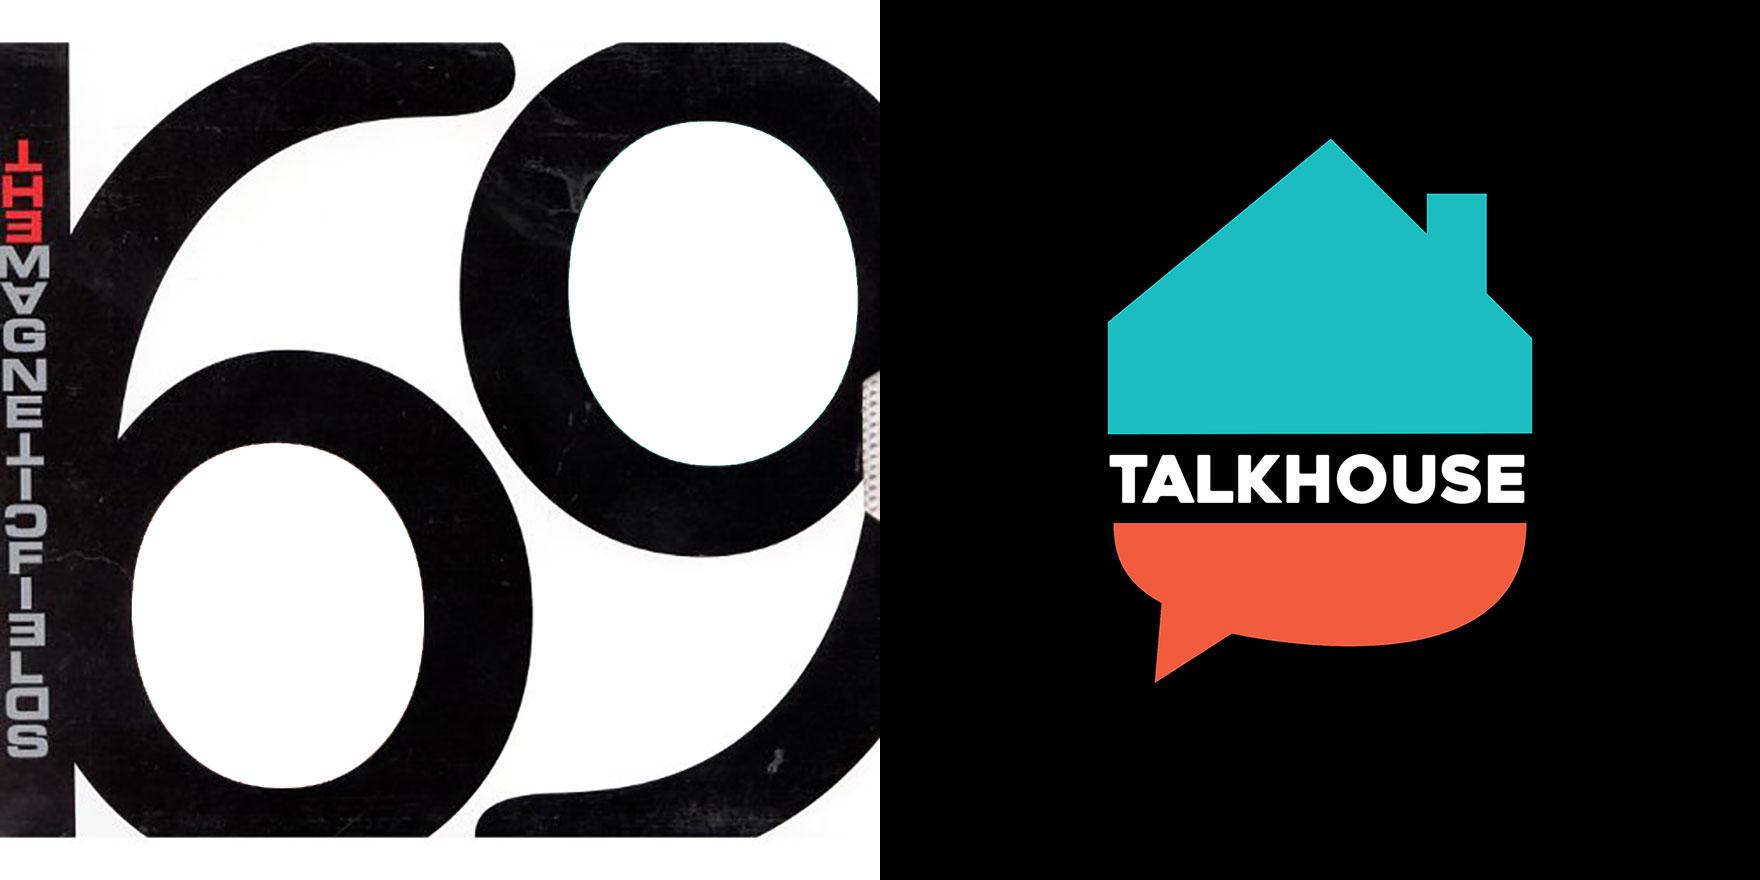 Stephin Merritt (the Magnetic Fields) Talks with Daniel Handler (Lemony Snicket) for the Talkhouse Podcast